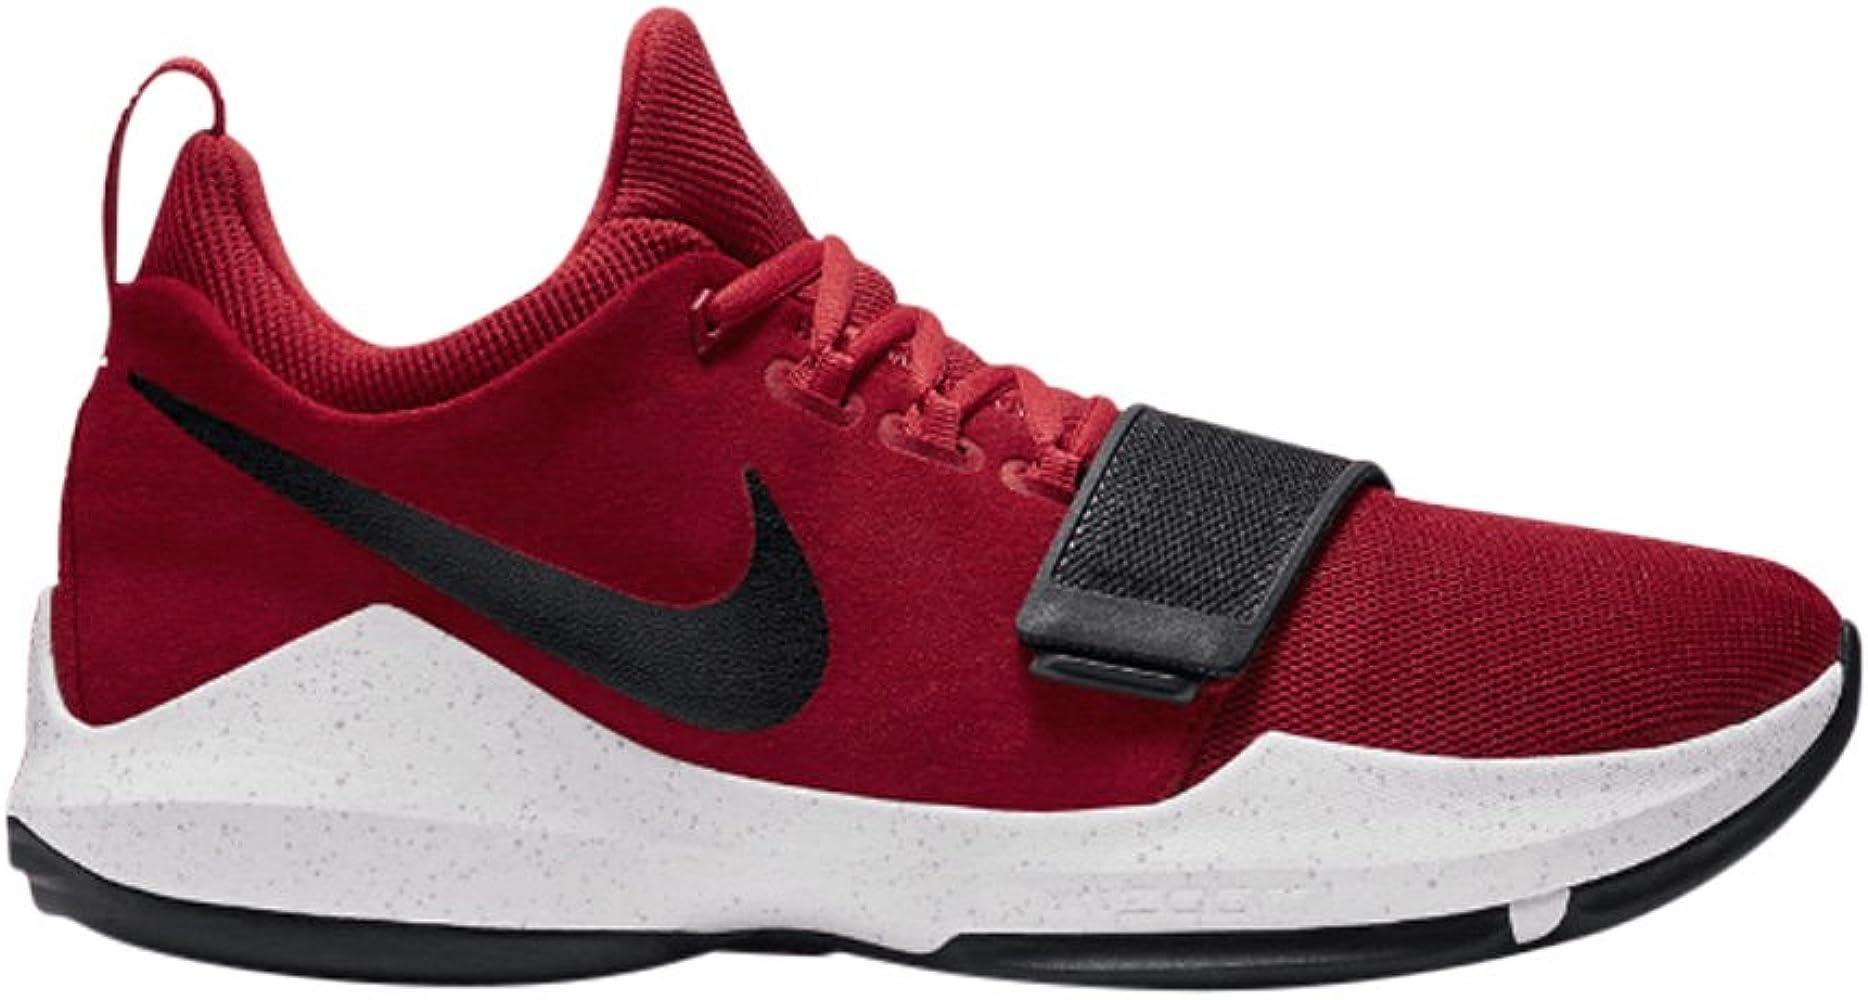 2d9d6ffadc0b2 Nike Paul George (PG) 1 Mens Basketball Shoes (10 D ... - Amazon.com